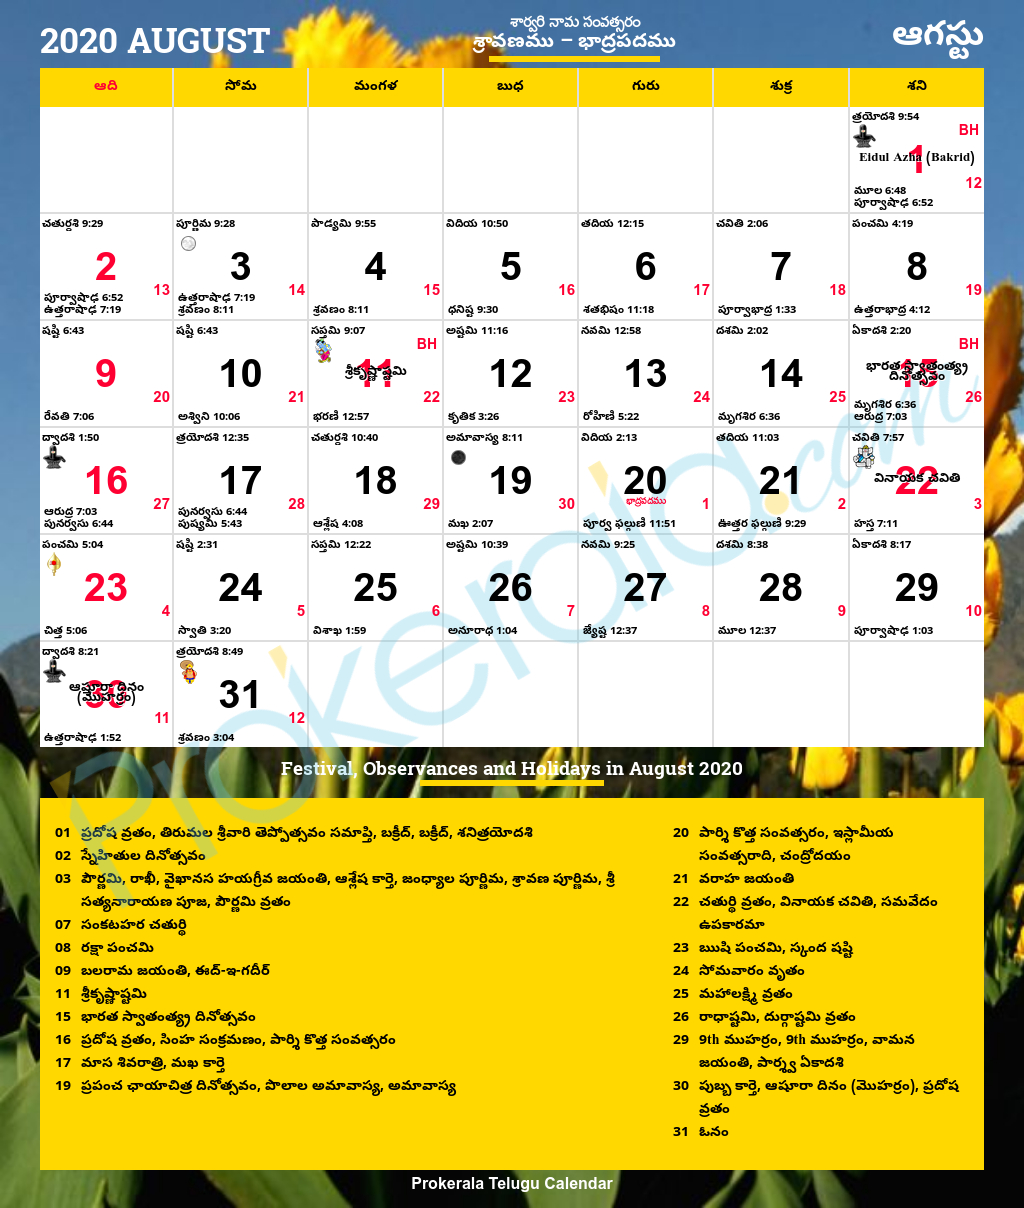 Telugu Calendar 2020, August in Kannada Calendar 2020 July